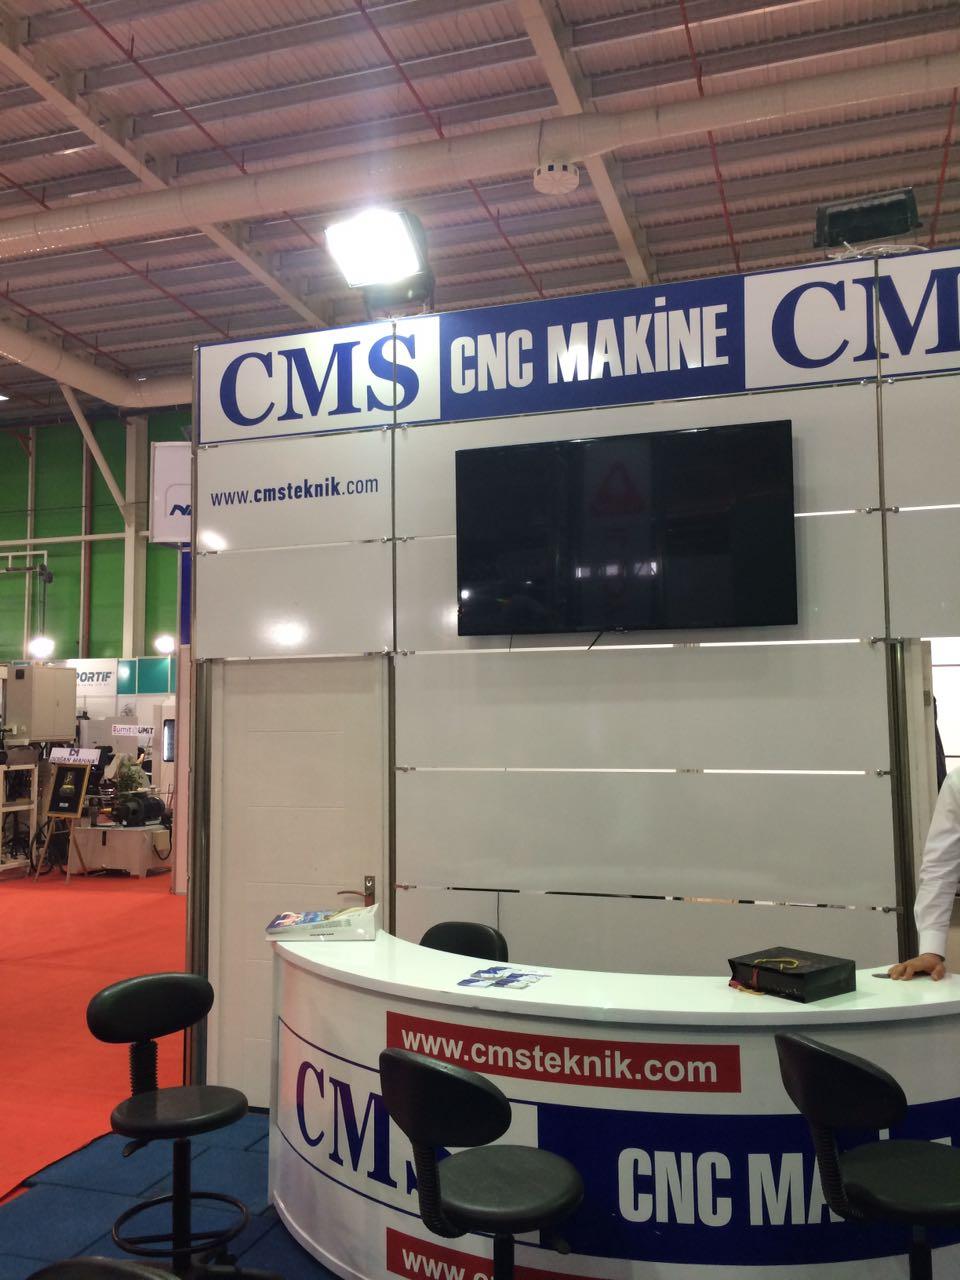 #konmak2017 #cmscncmakine cms cnc makine fuar standı